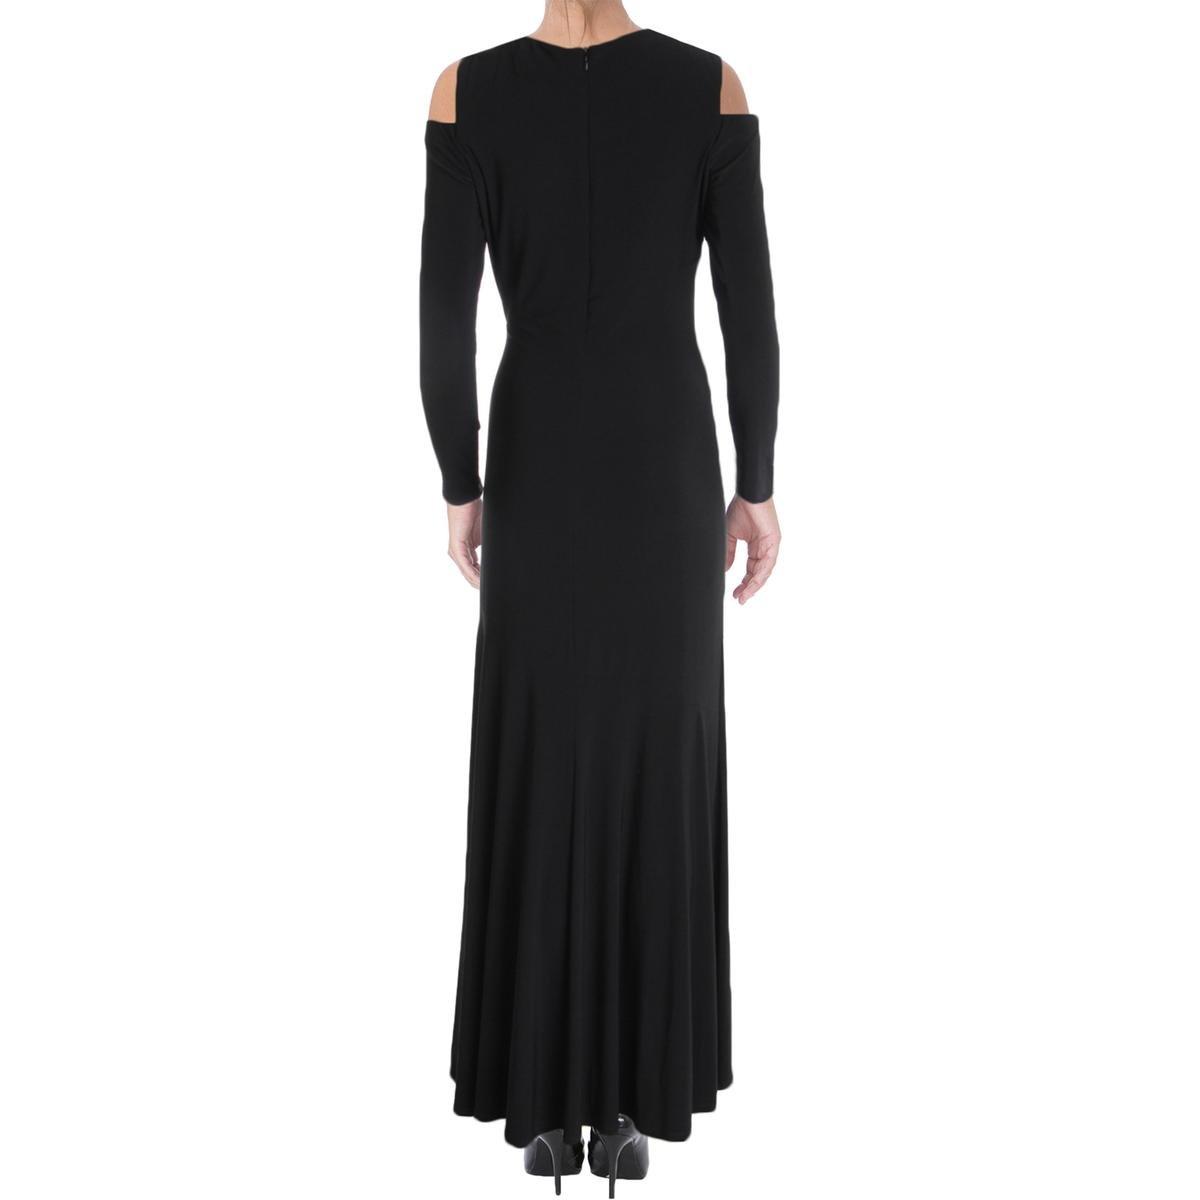 c1d095047f4 Lauren Ralph Lauren Womens Matte Jersey Cold Shoulder Evening Dress Black 2  at Amazon Women s Clothing store